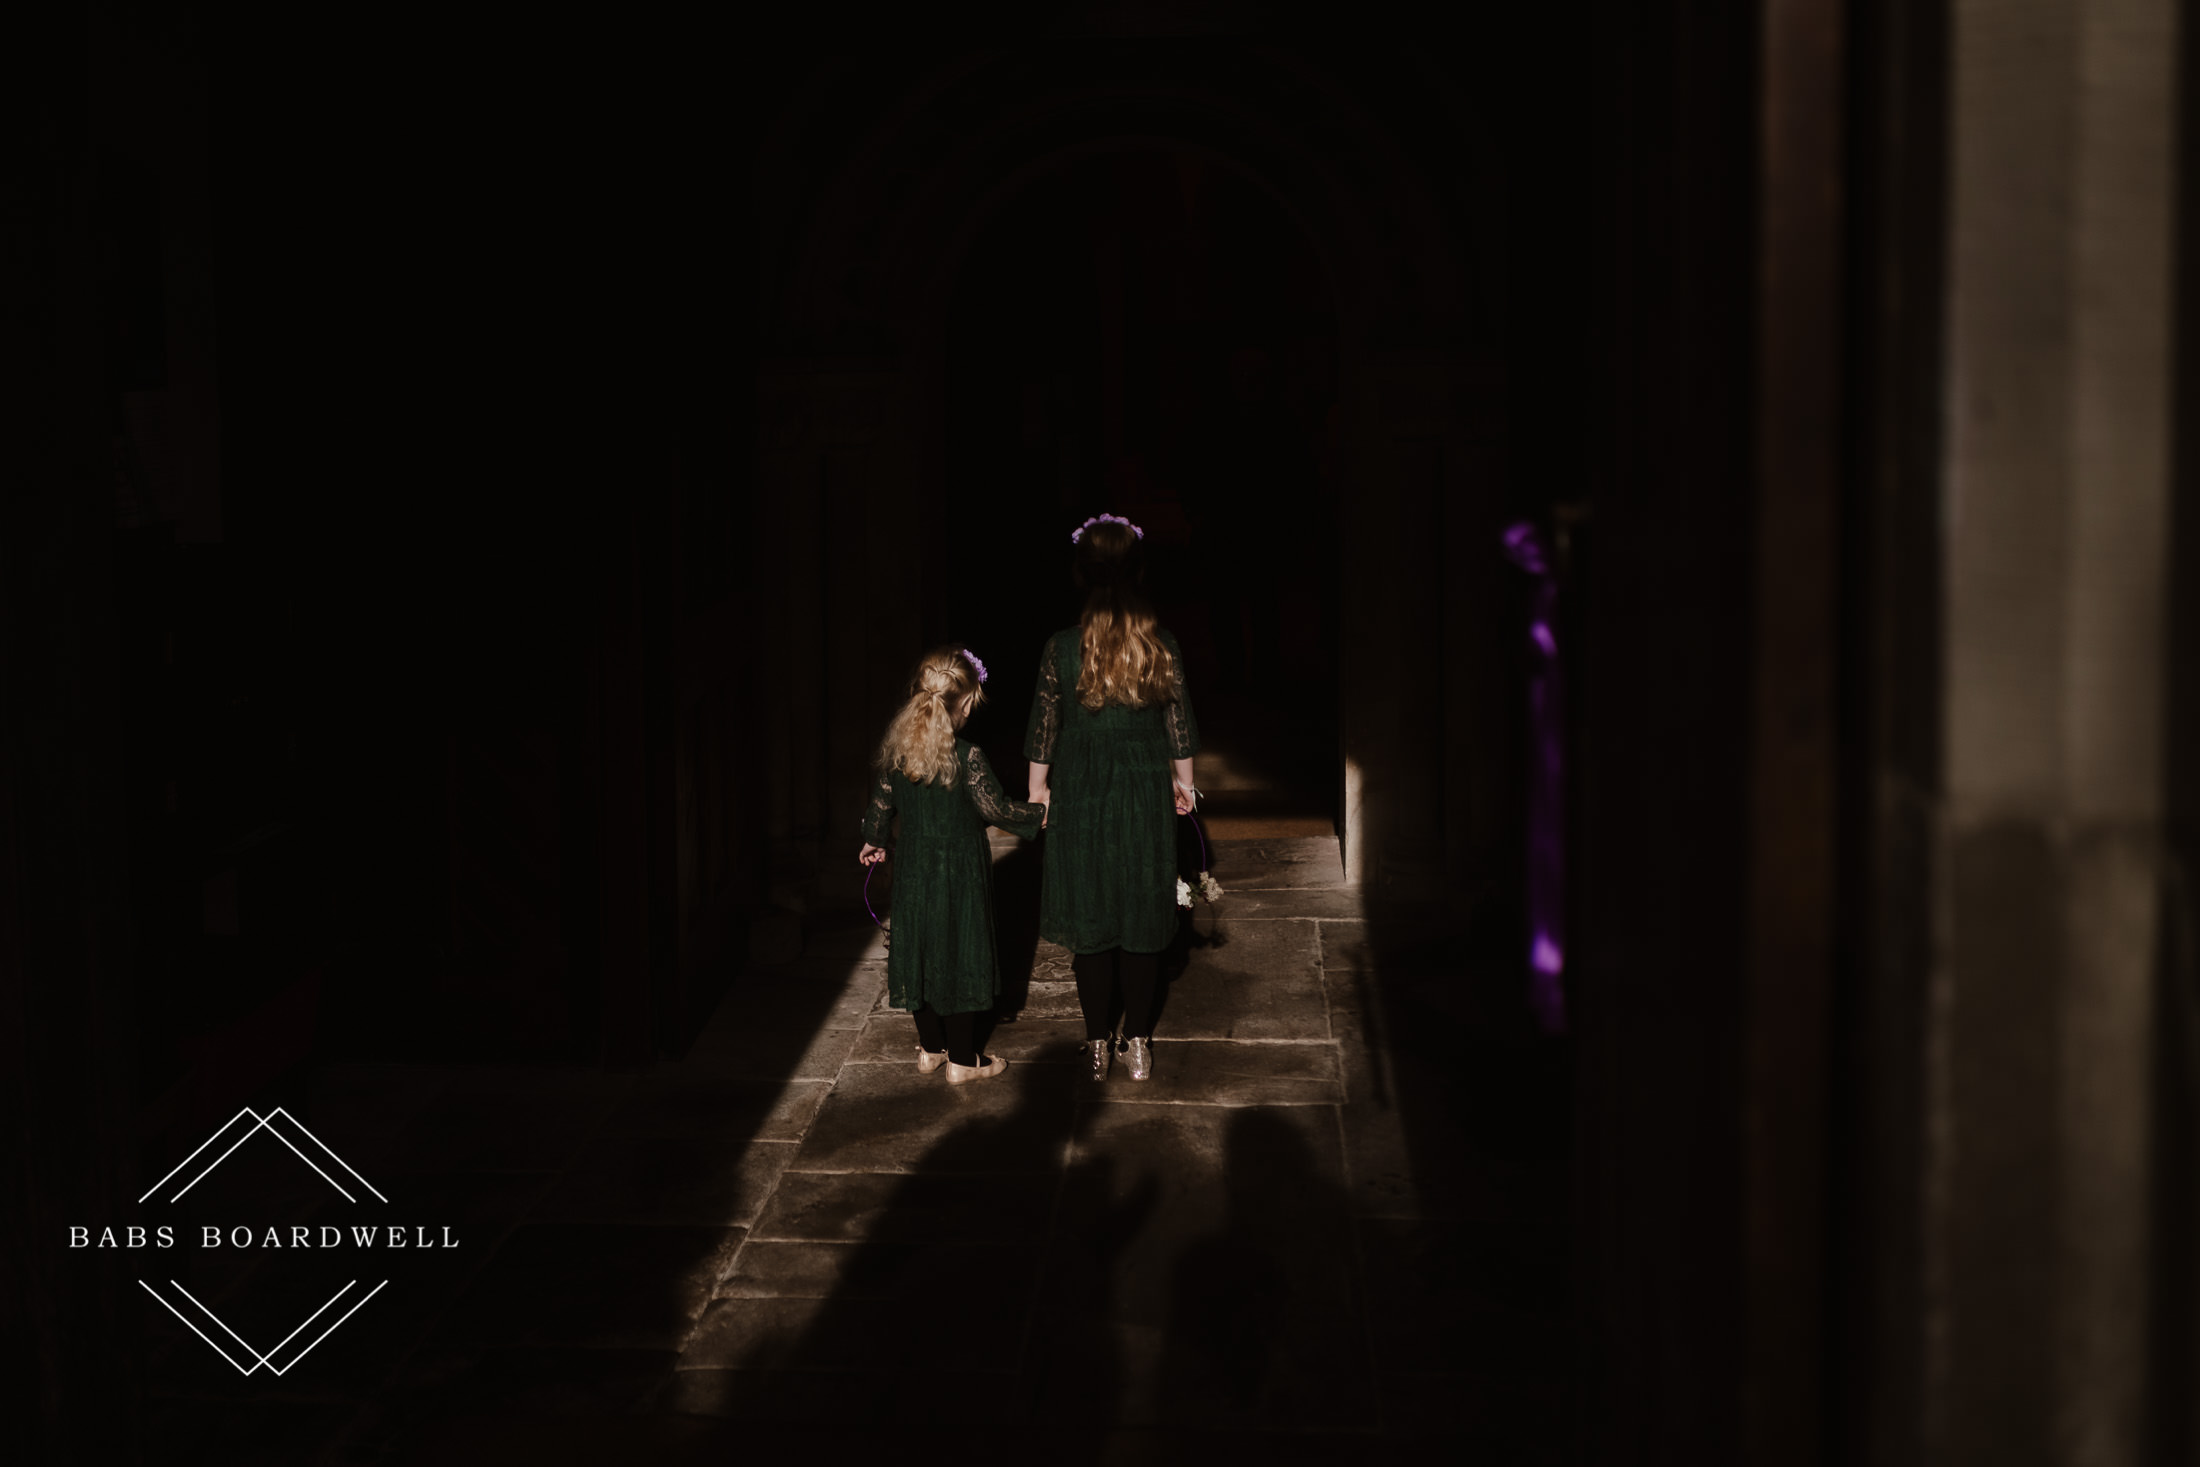 bridesmaids in a light pocket at St. Briavels Church